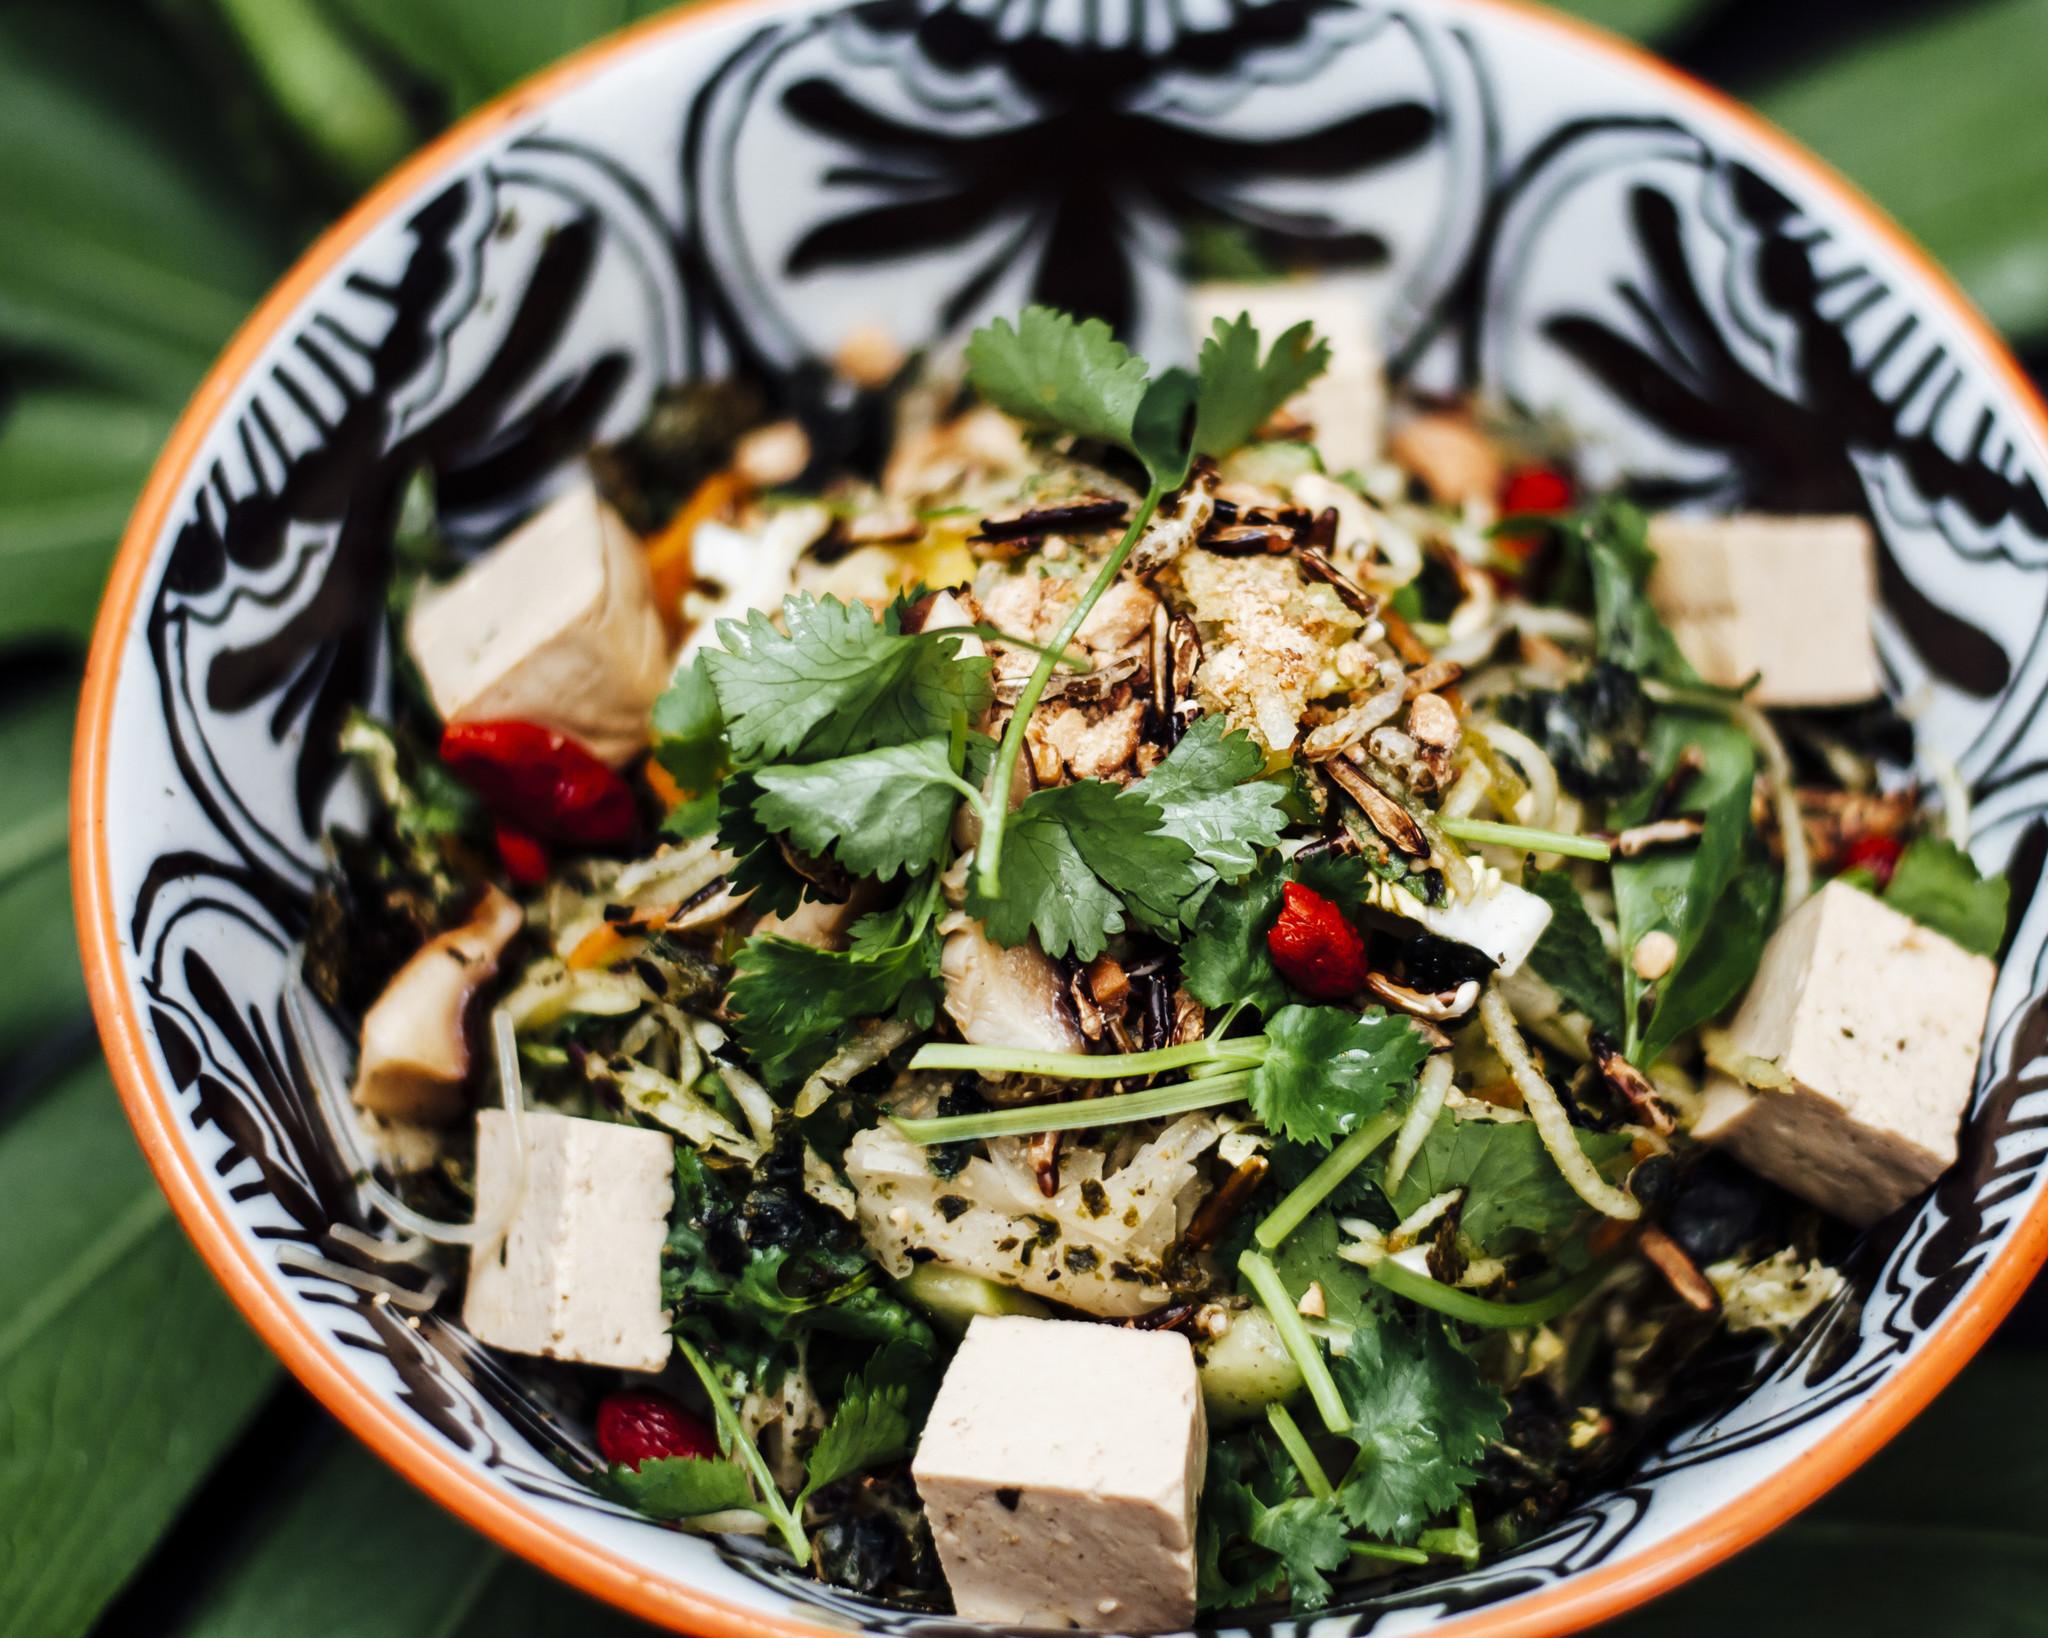 Vegan E Plant Based Restaurants Launch Dining Promotion Oct 1 15 Sun Sentinel